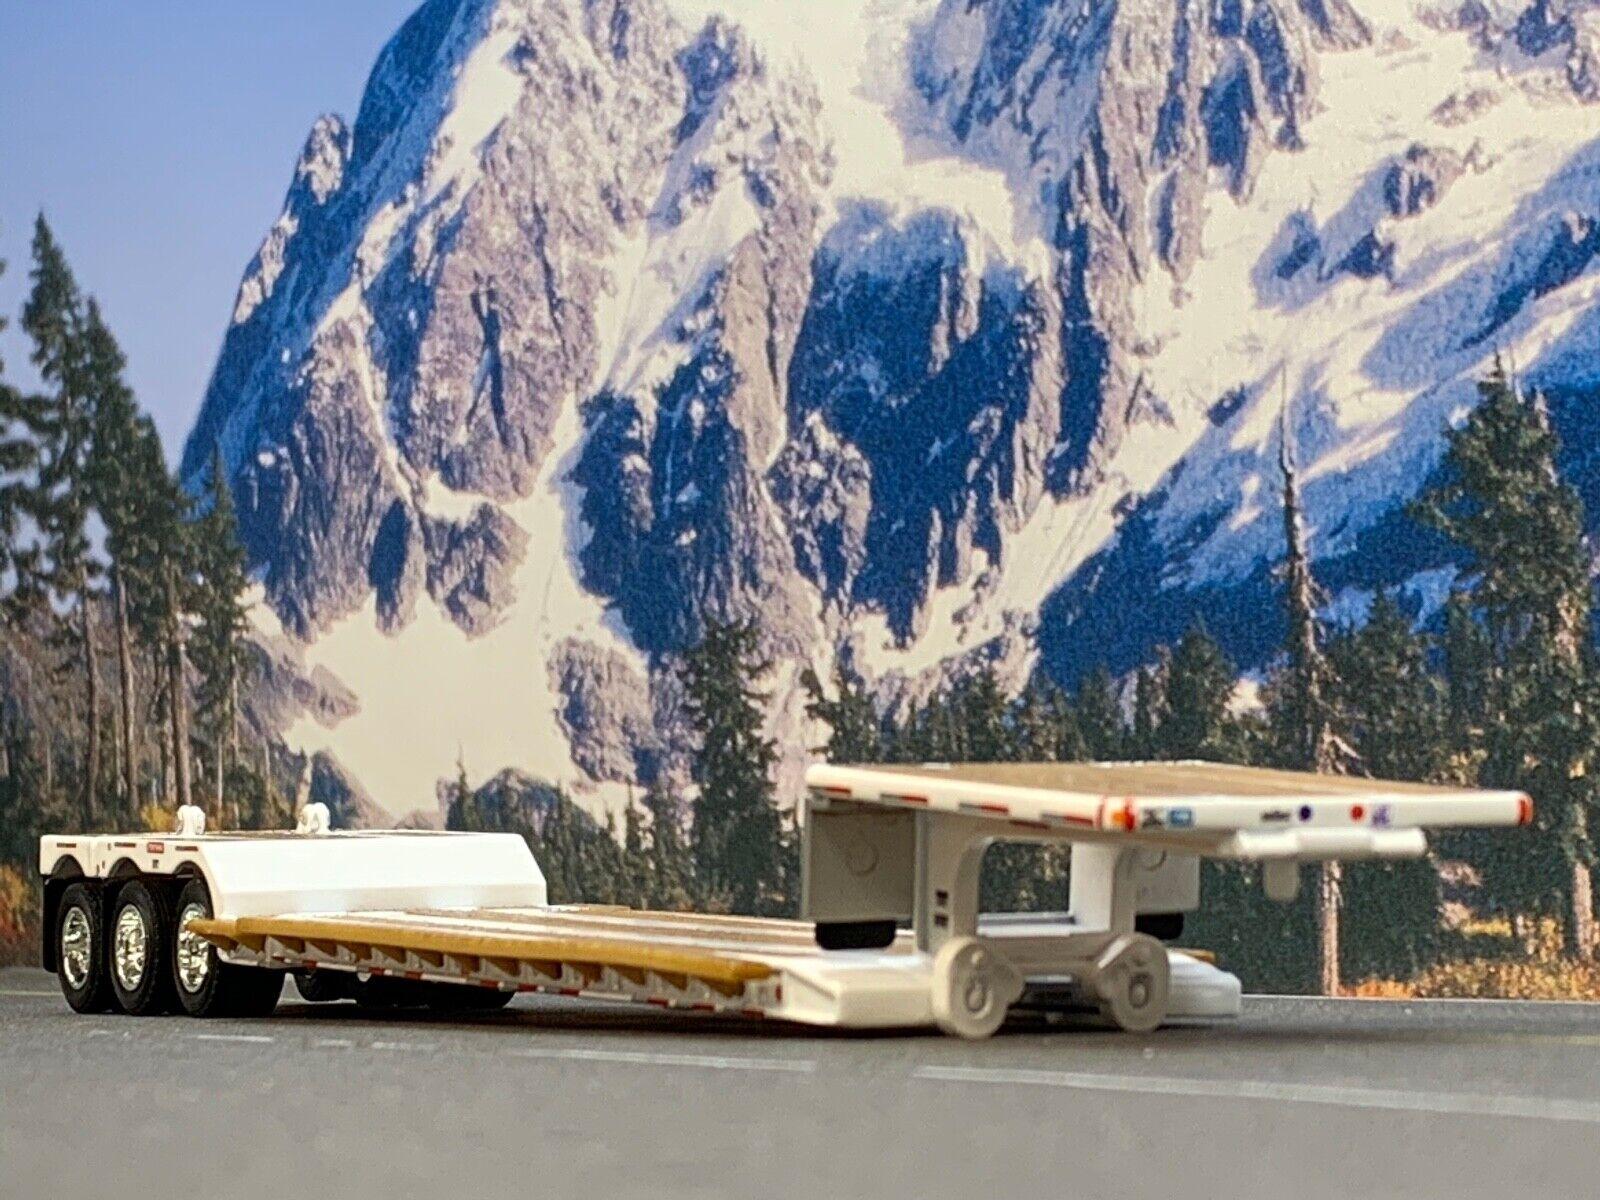 1/64 DCP WHITE FONTAINE RENEGADE TRI AXLE STRETCH LOWBOY TRAILER 2